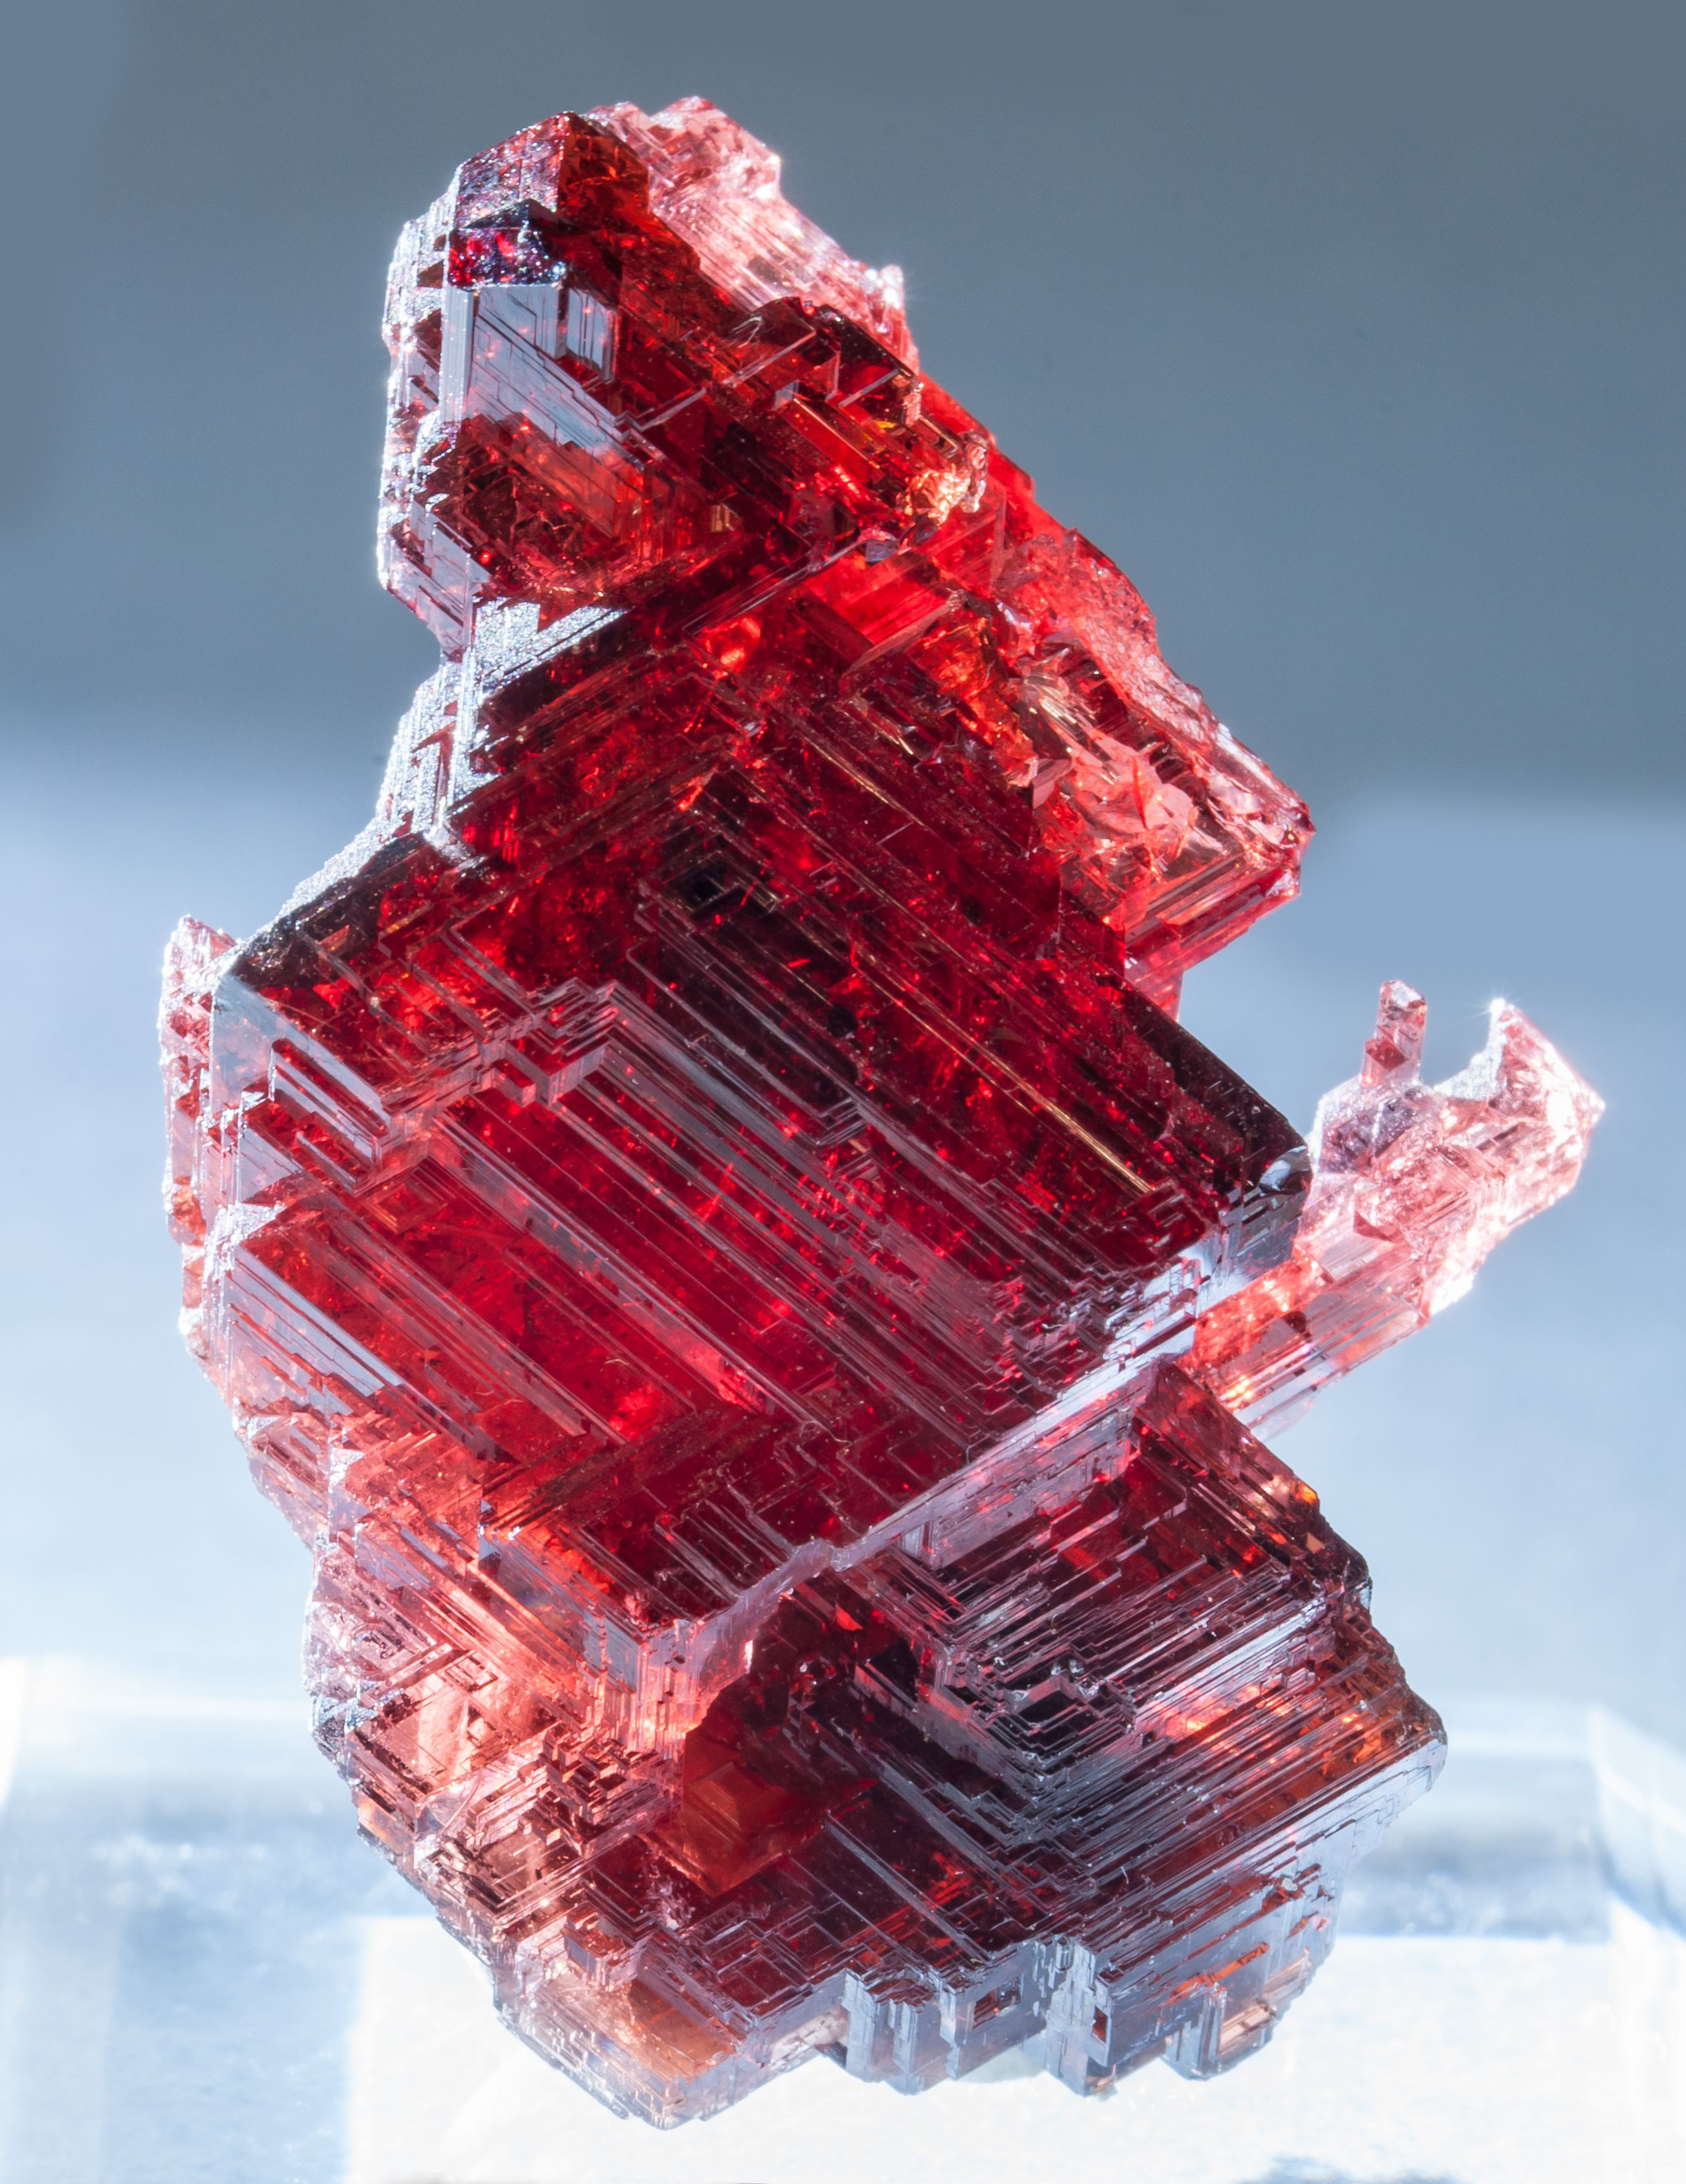 Specimens S Imagesq8 Spessartine Tv68q8f2 Jpg Minerals And